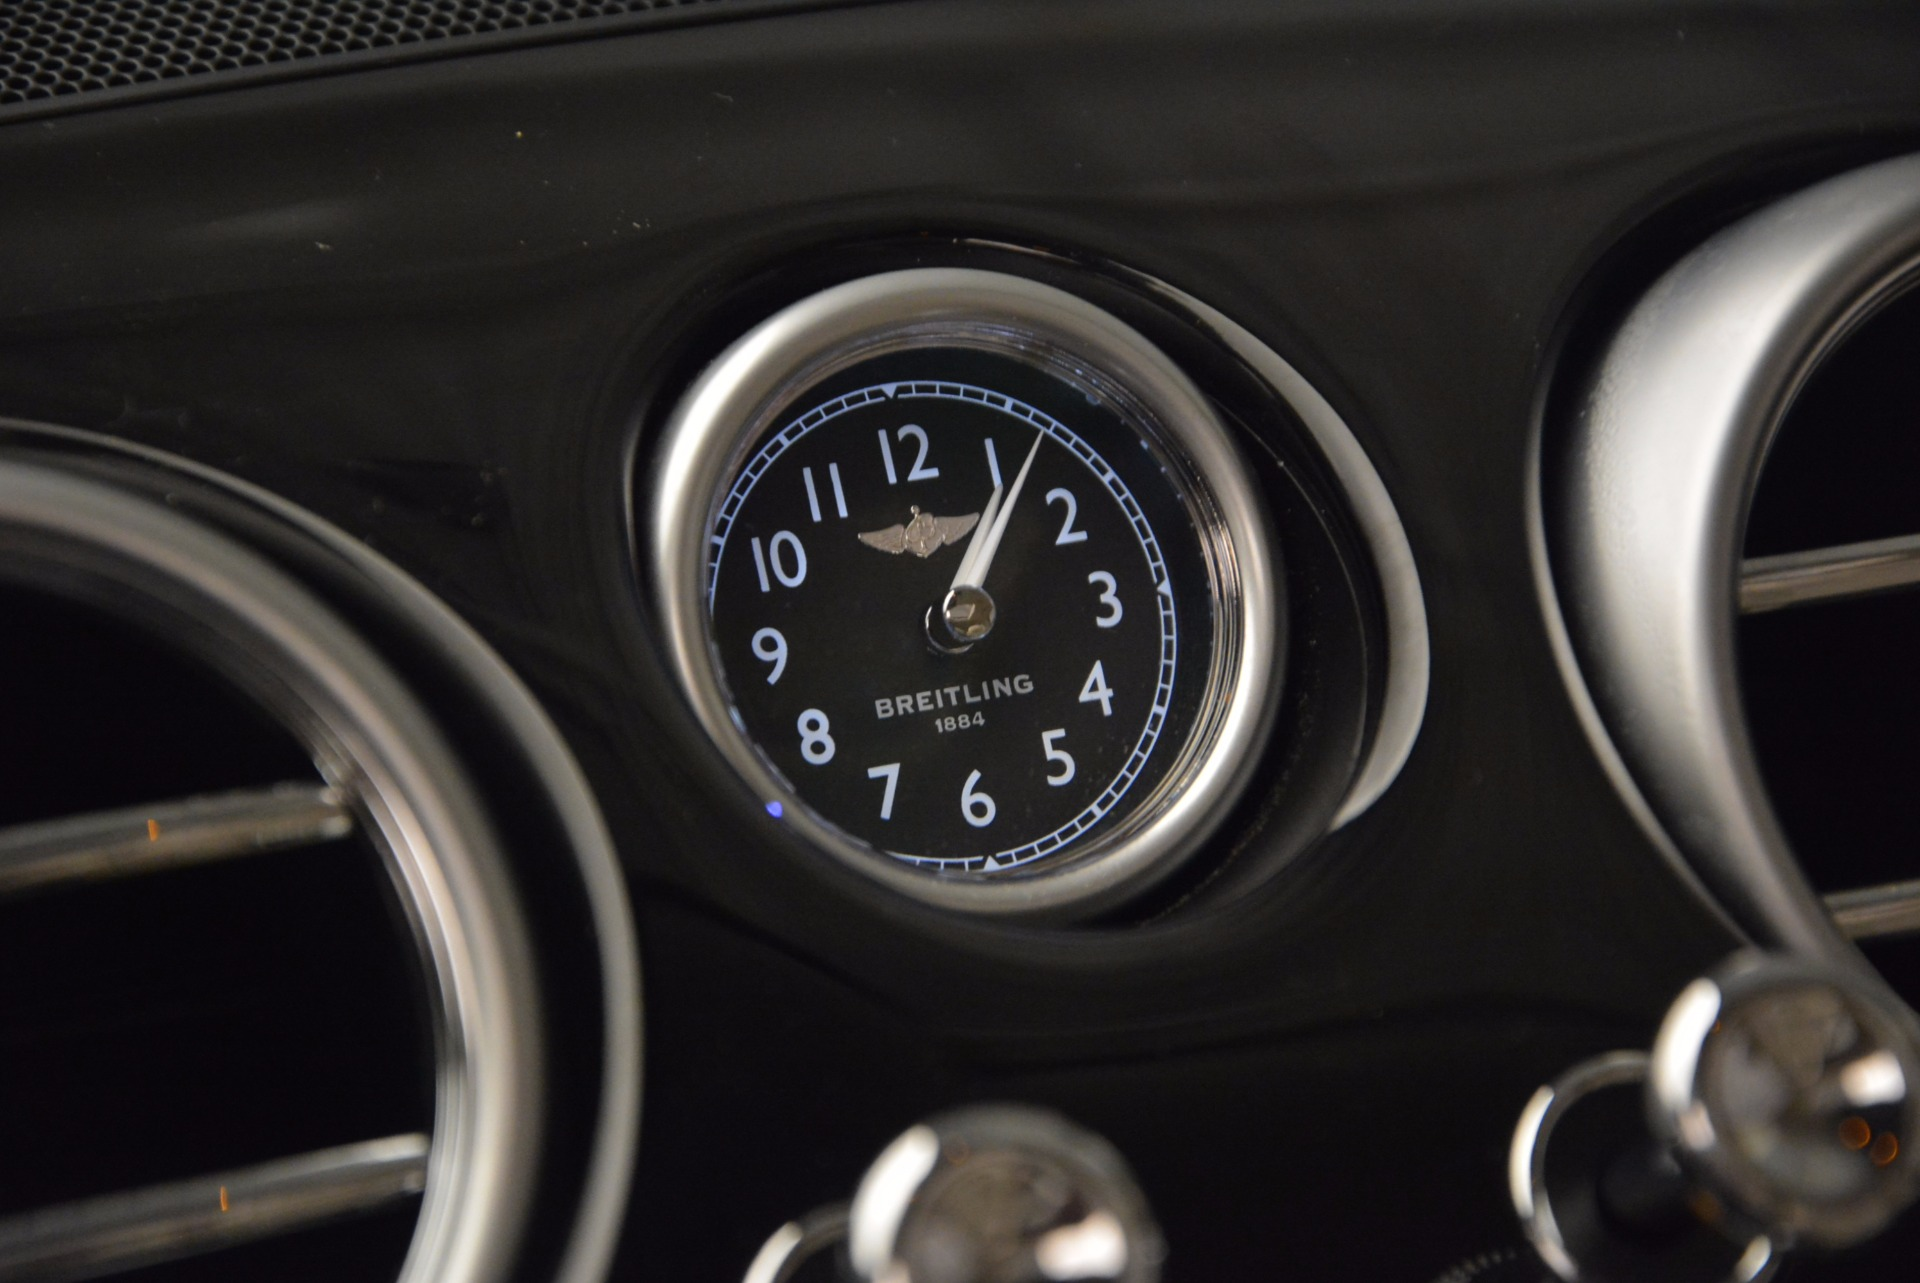 Used 2015 Bentley Flying Spur W12 For Sale In Westport, CT 1582_p26